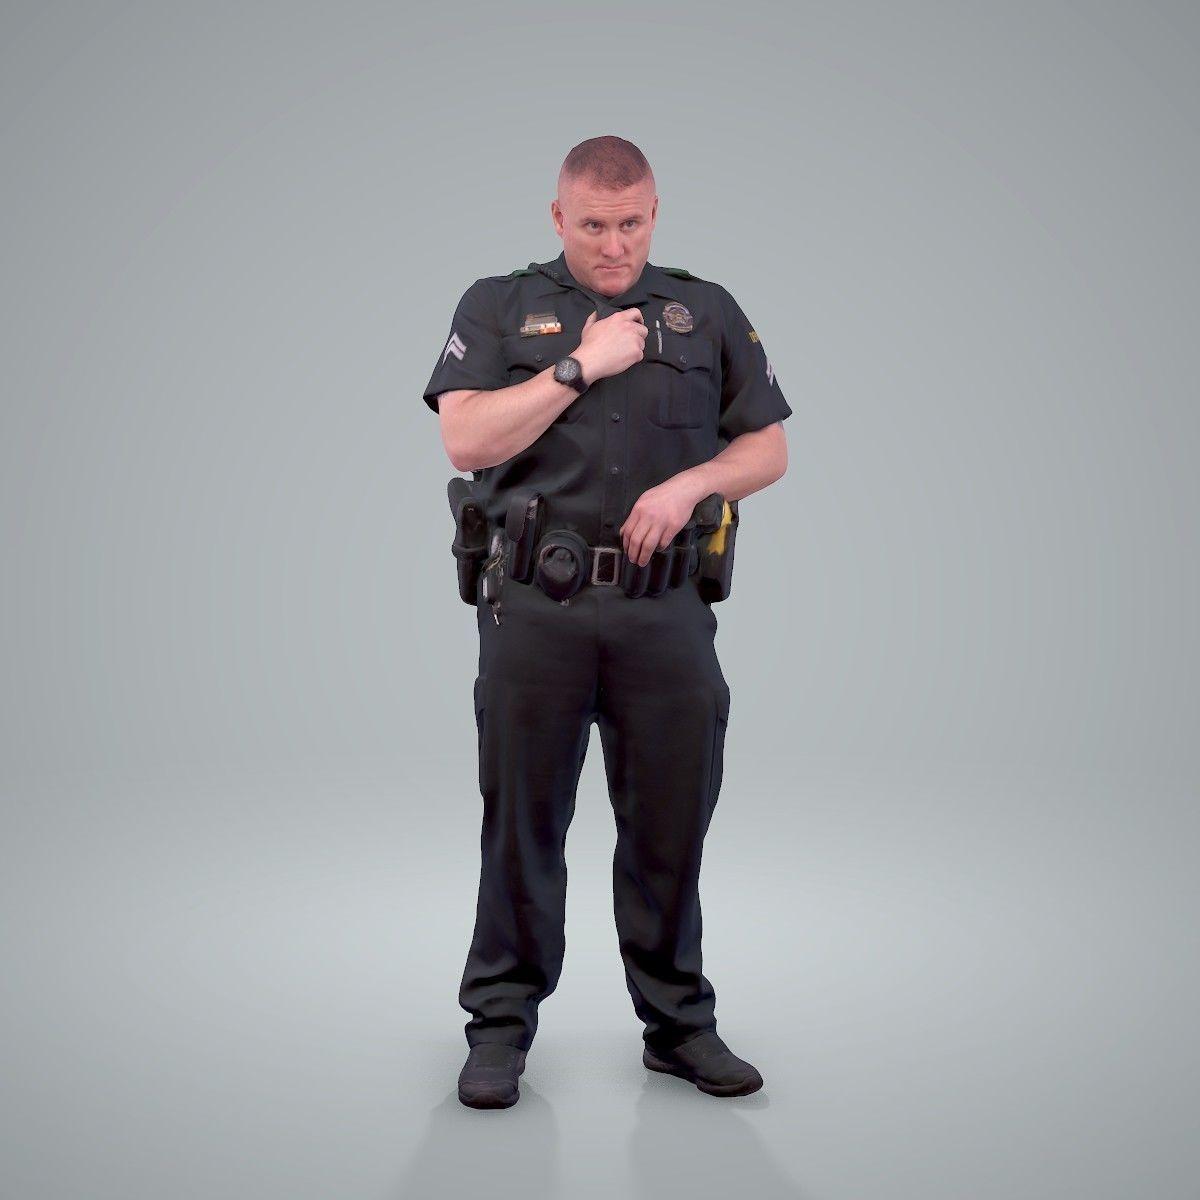 Policeman Talking to Ration CMan0208-HD2-O01P01-S